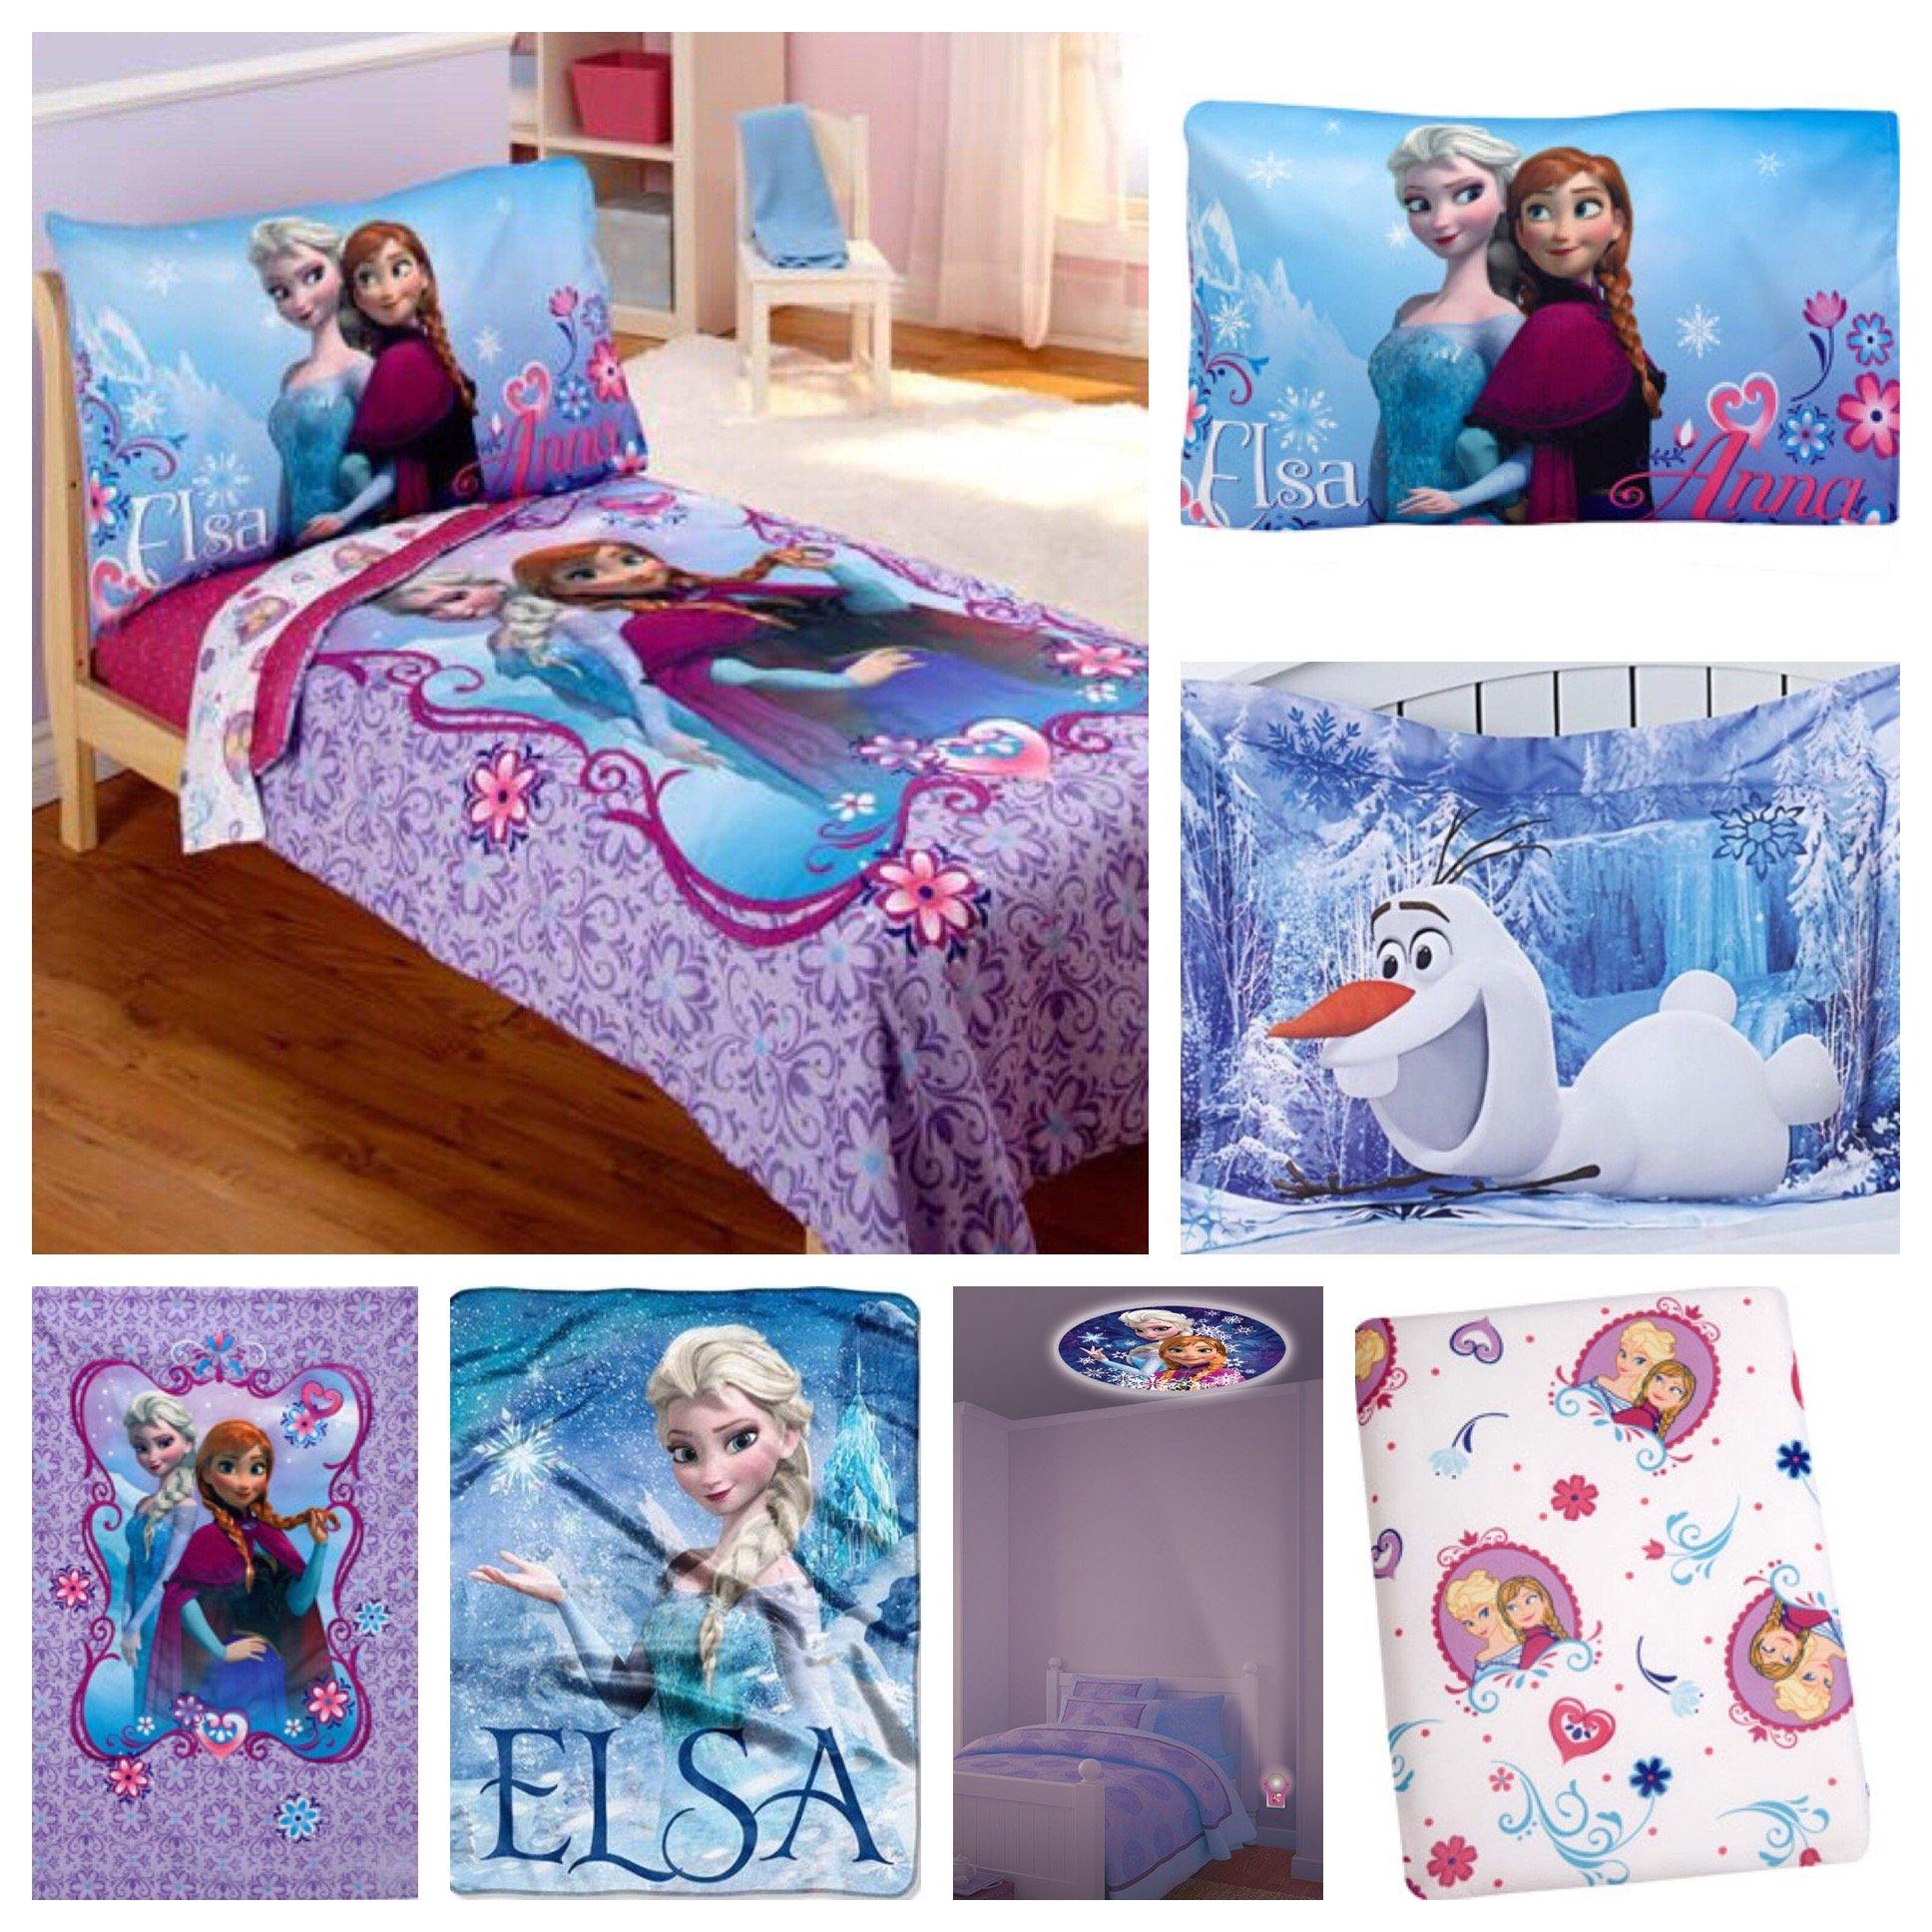 Disney Frozen Bedding Set & Night Light - Toddler